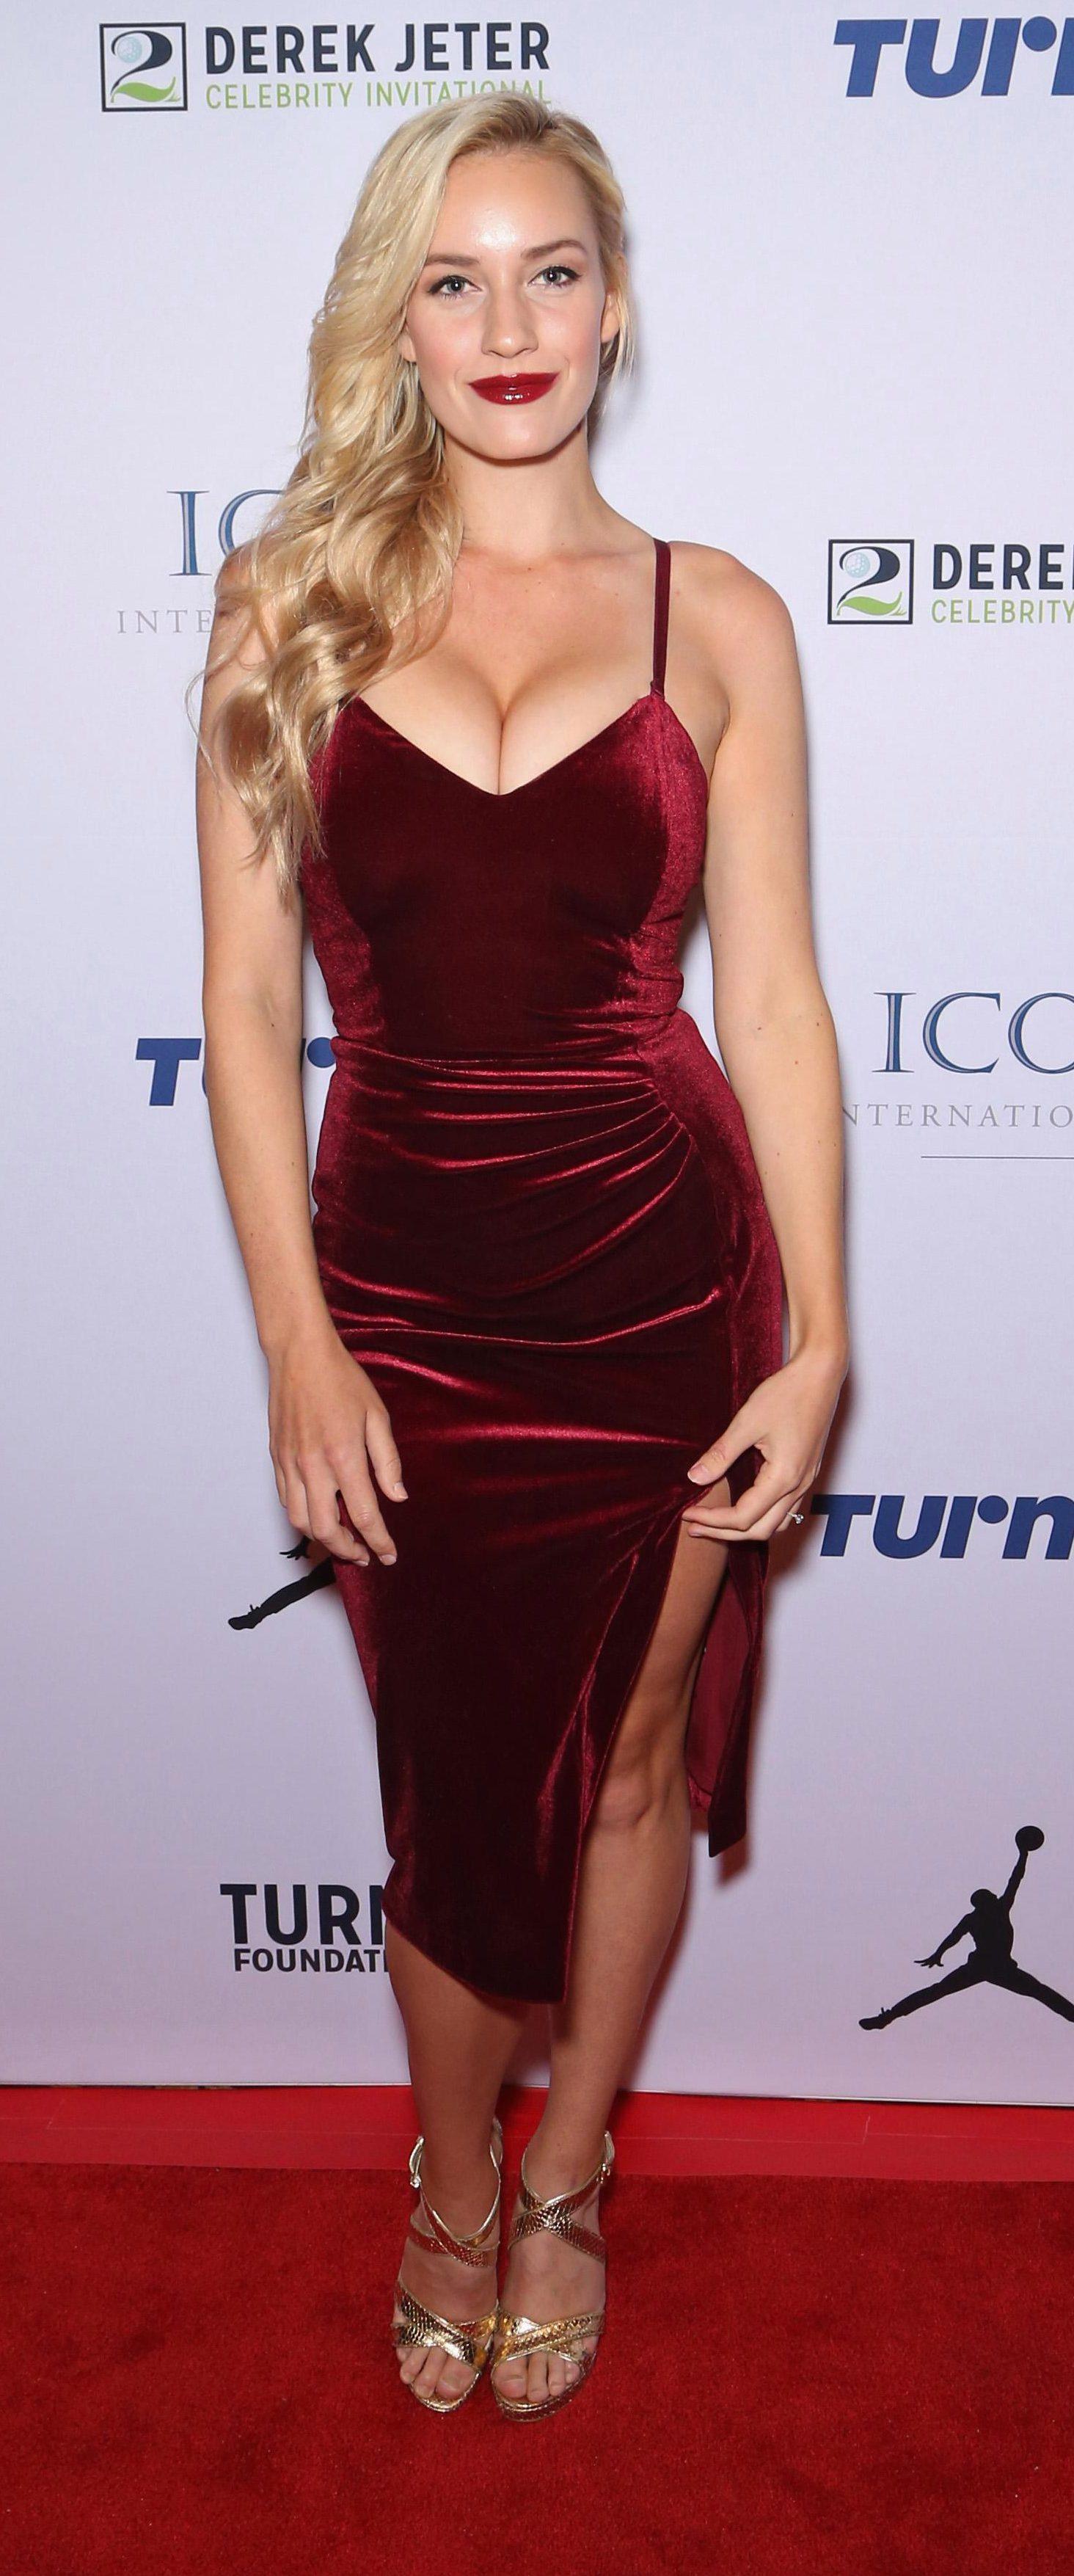 Paige Spiranac attending the 2017 Derek Jeter Celebrity Invitational gala in Las Vegas, Nevada